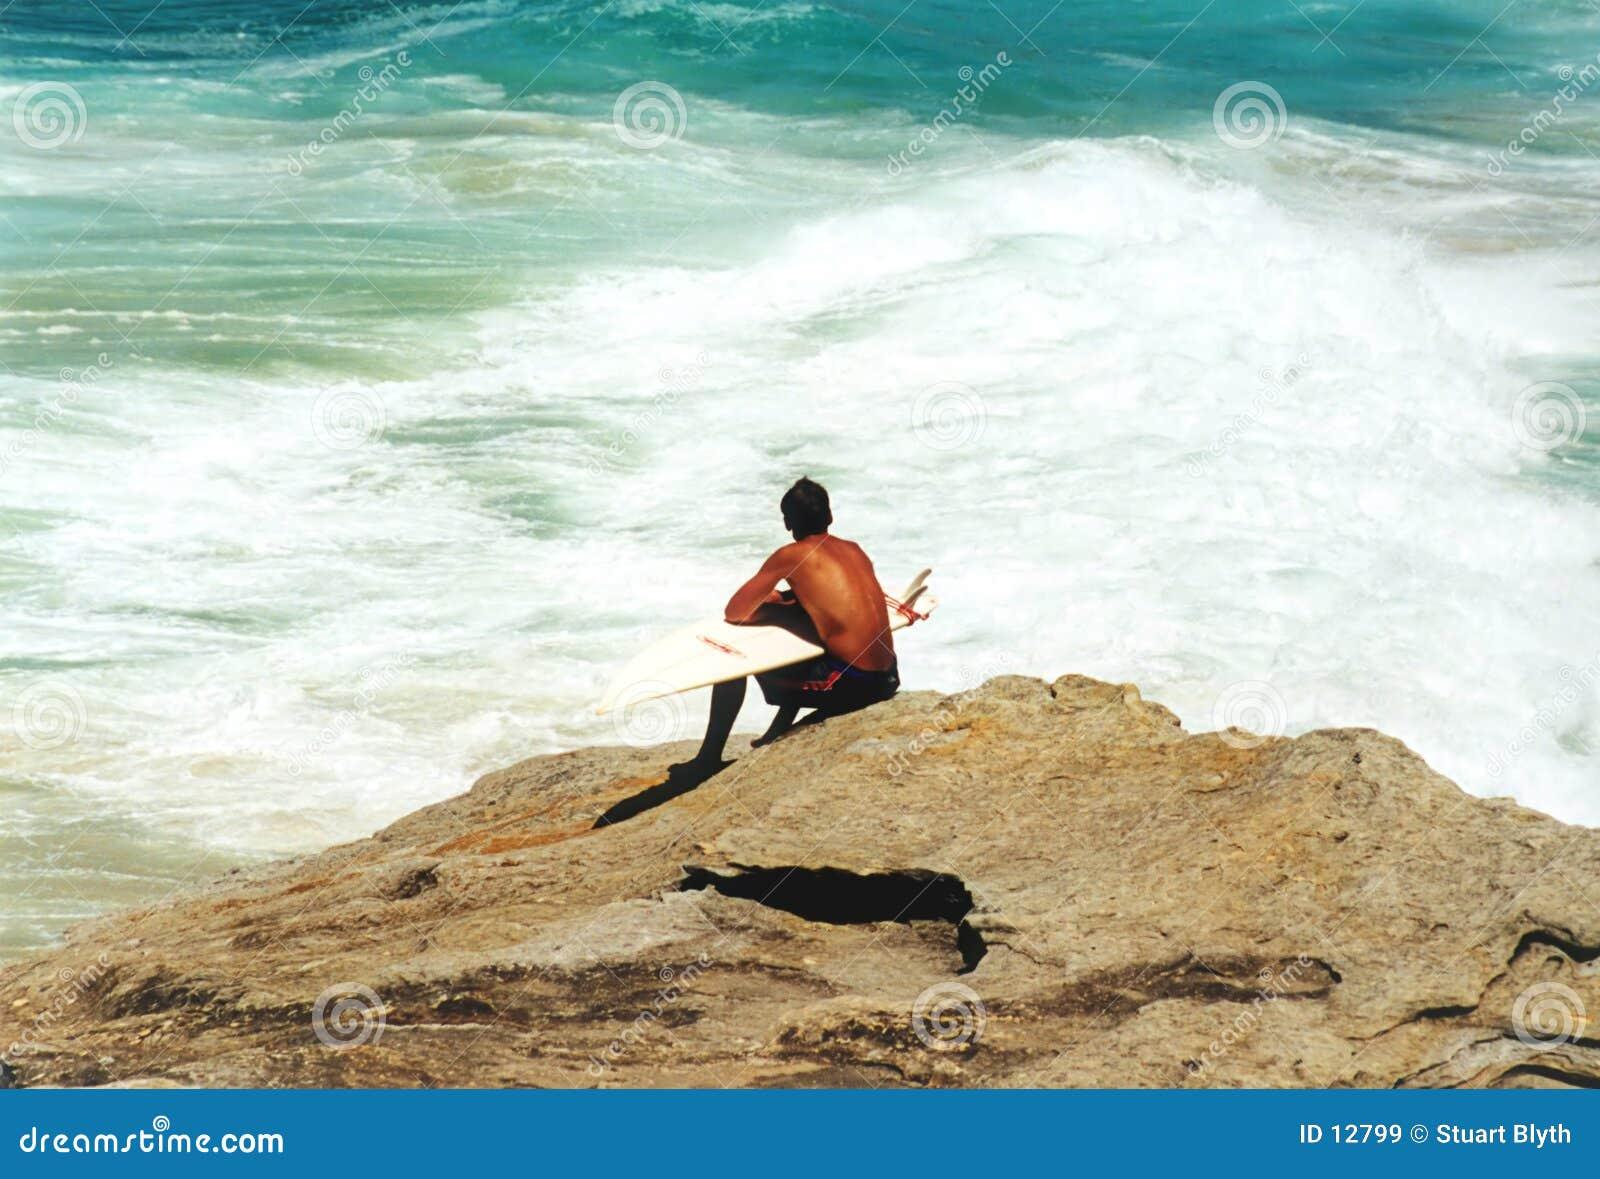 Surfer Waiting